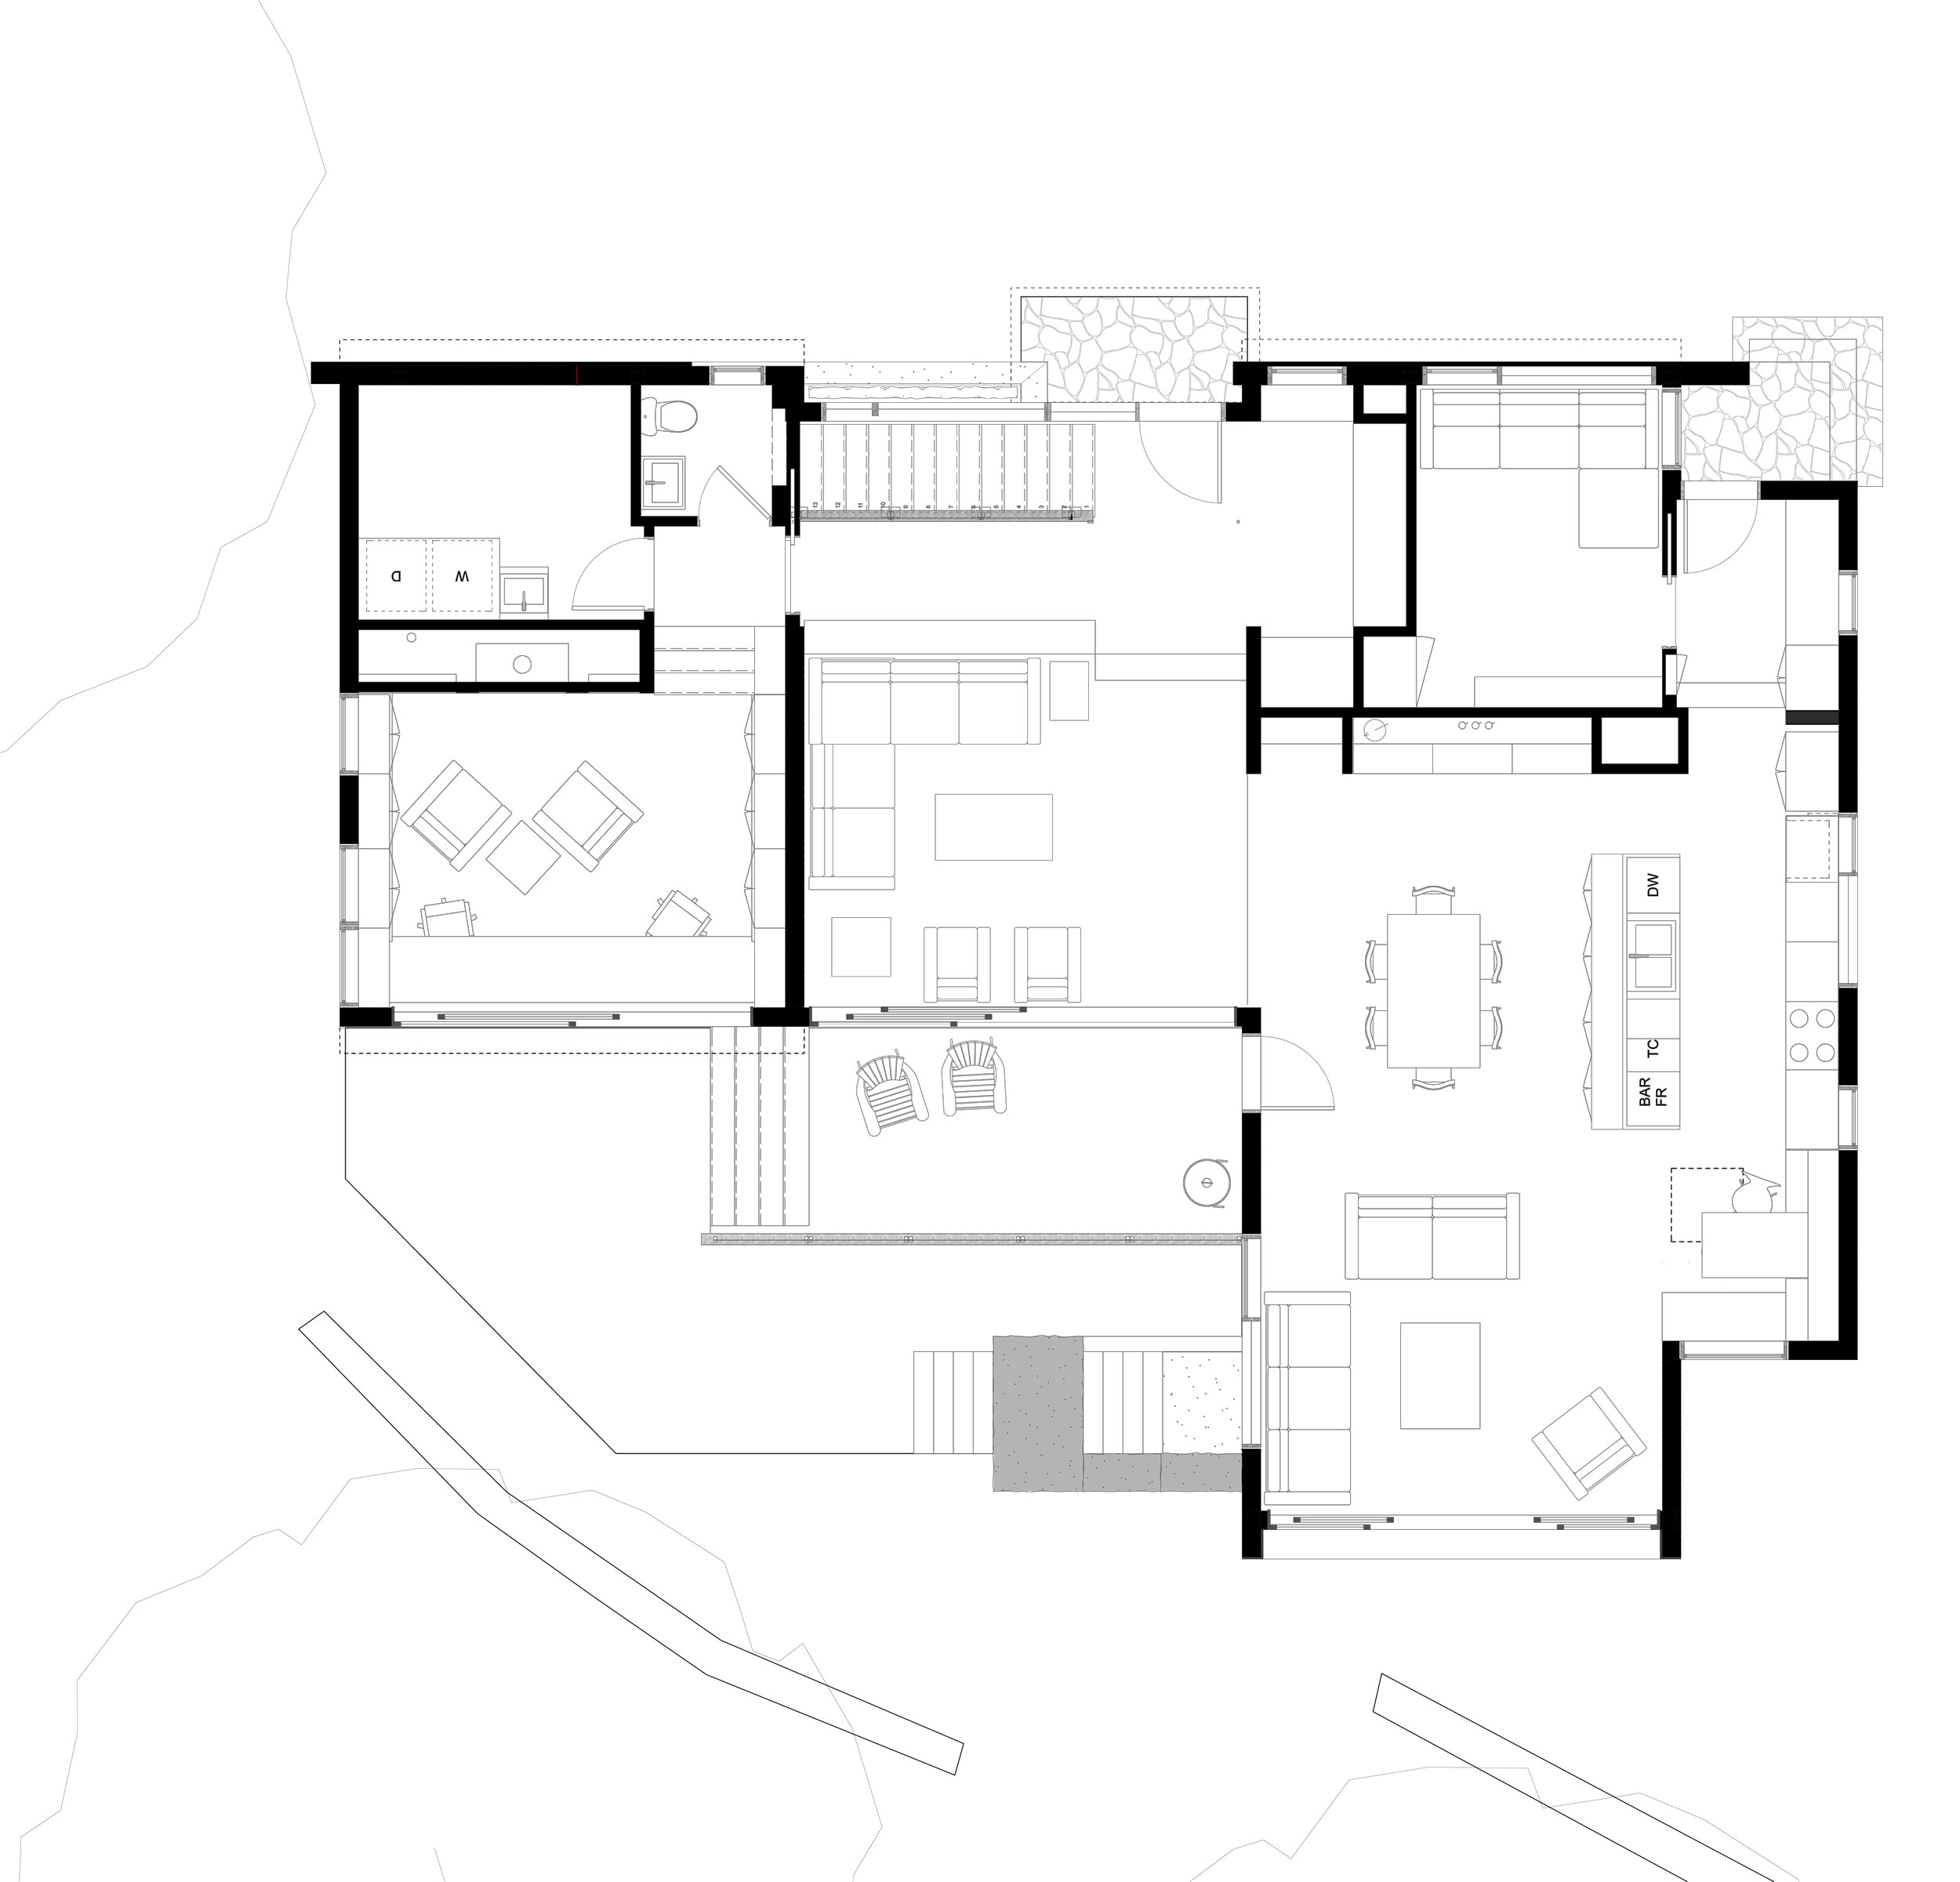 проект эко-дома от студии altius architecture